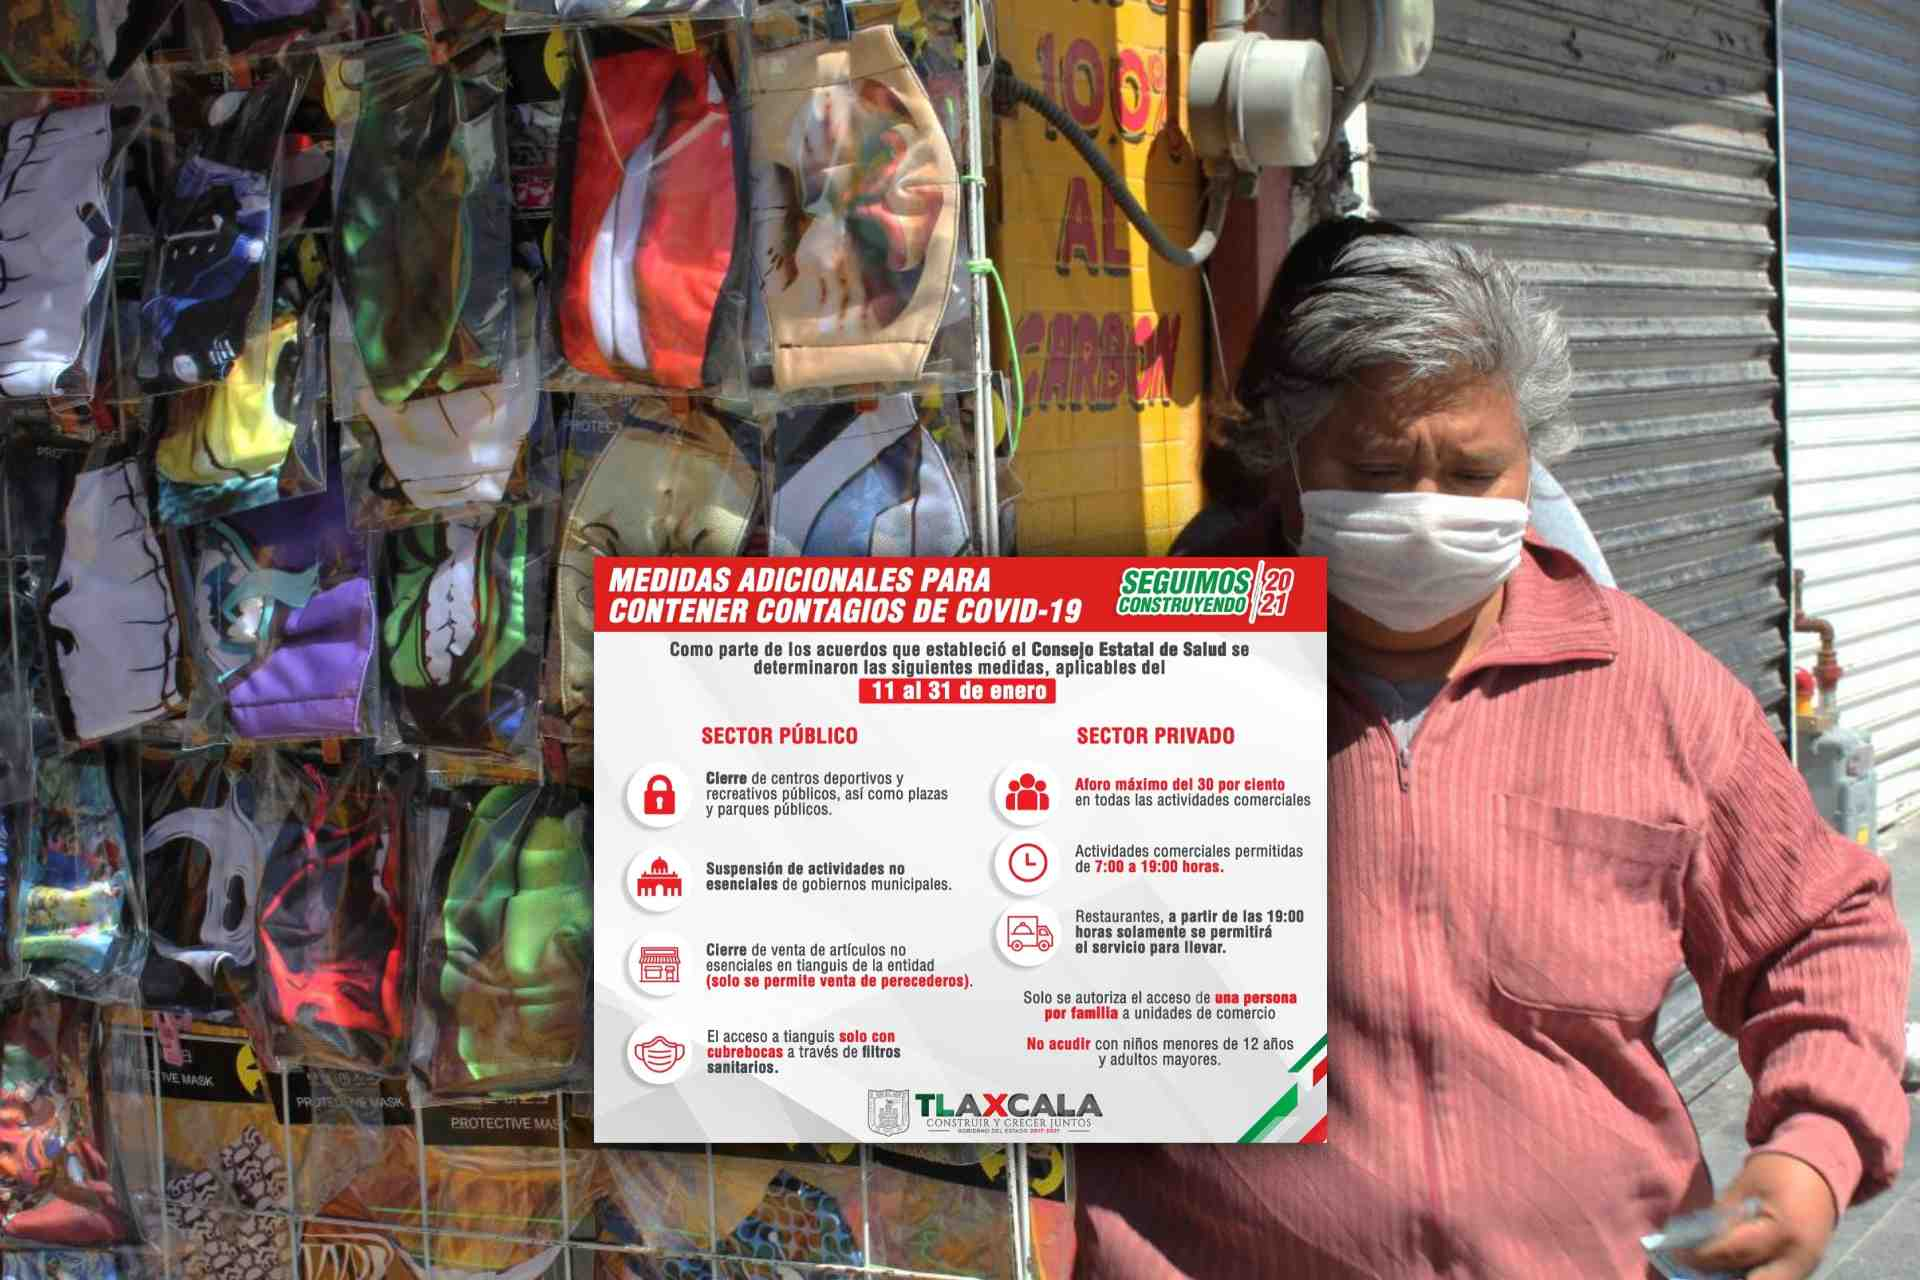 ambulantaje-comercio-informal-covid-19-Tlaxcala-medidas